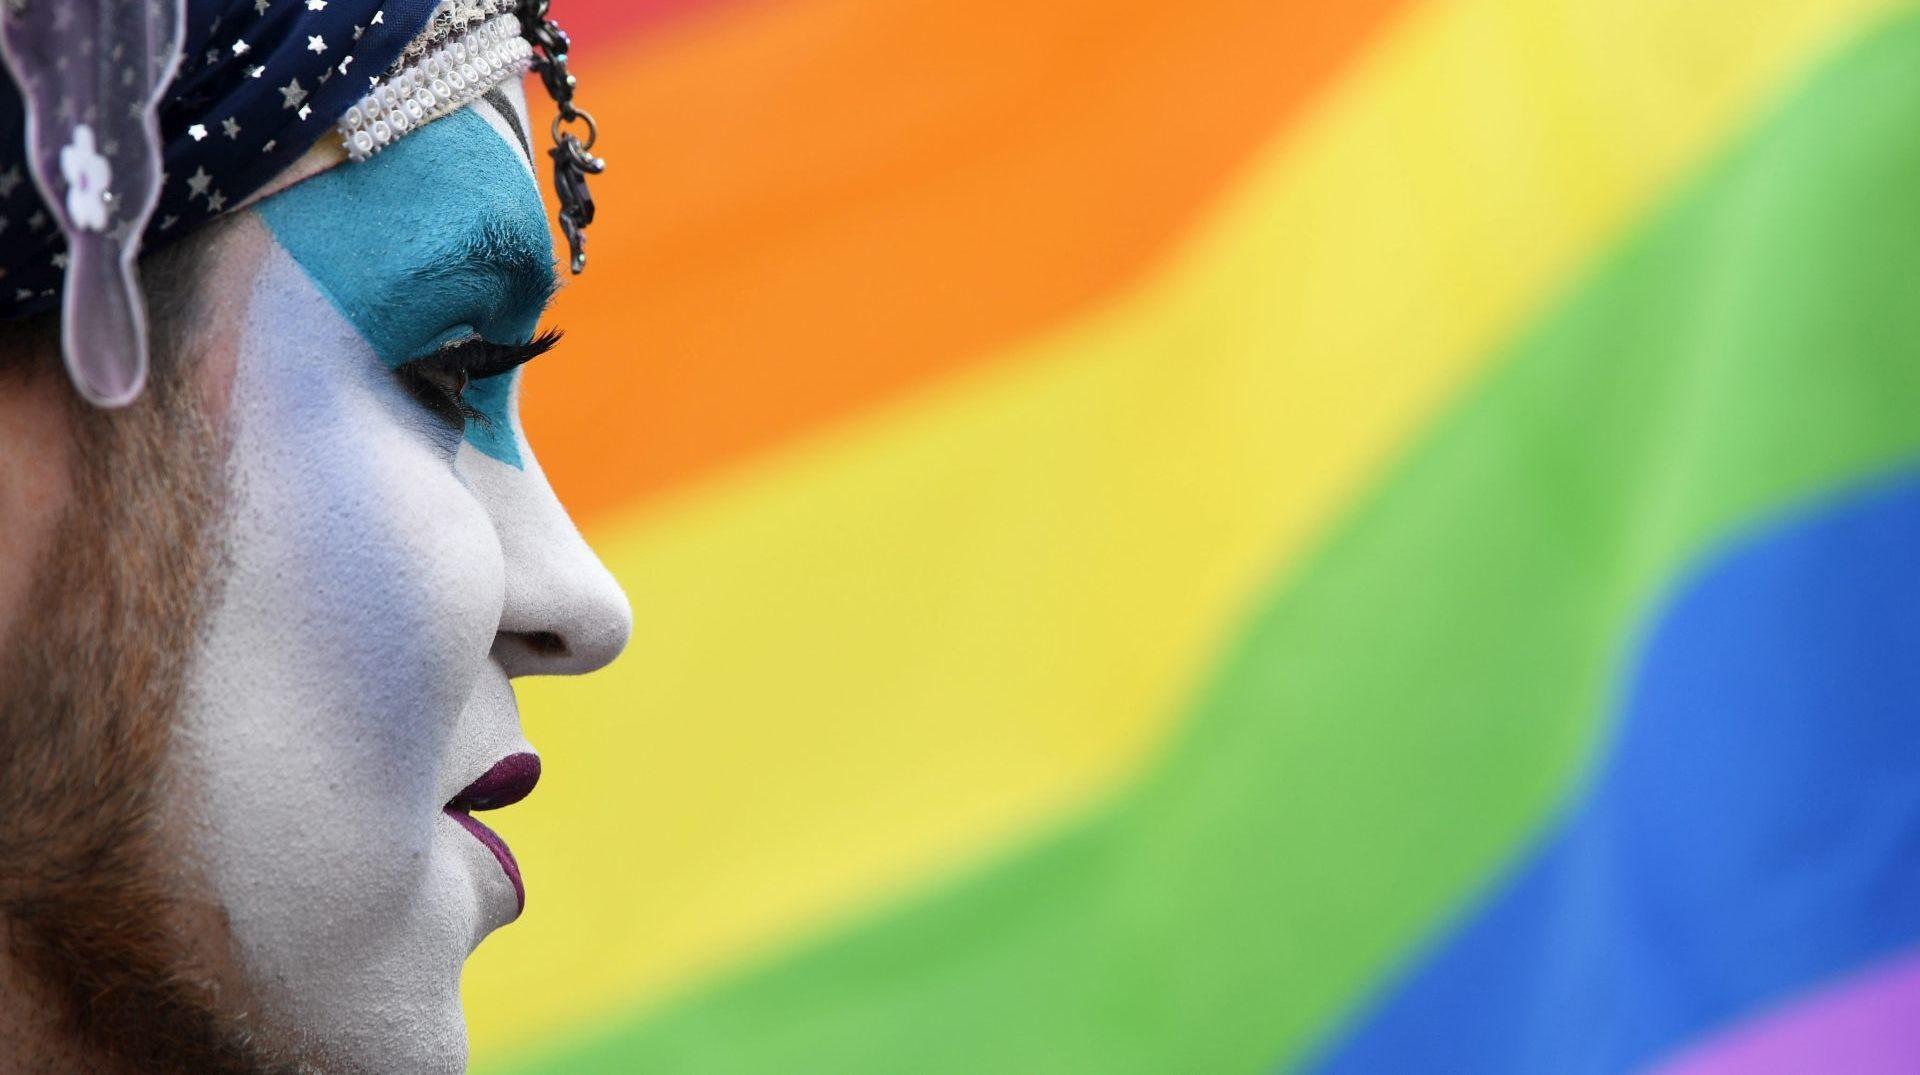 VIDEO: Prvi javni LGBT festival u azijskoj državi Mianmar